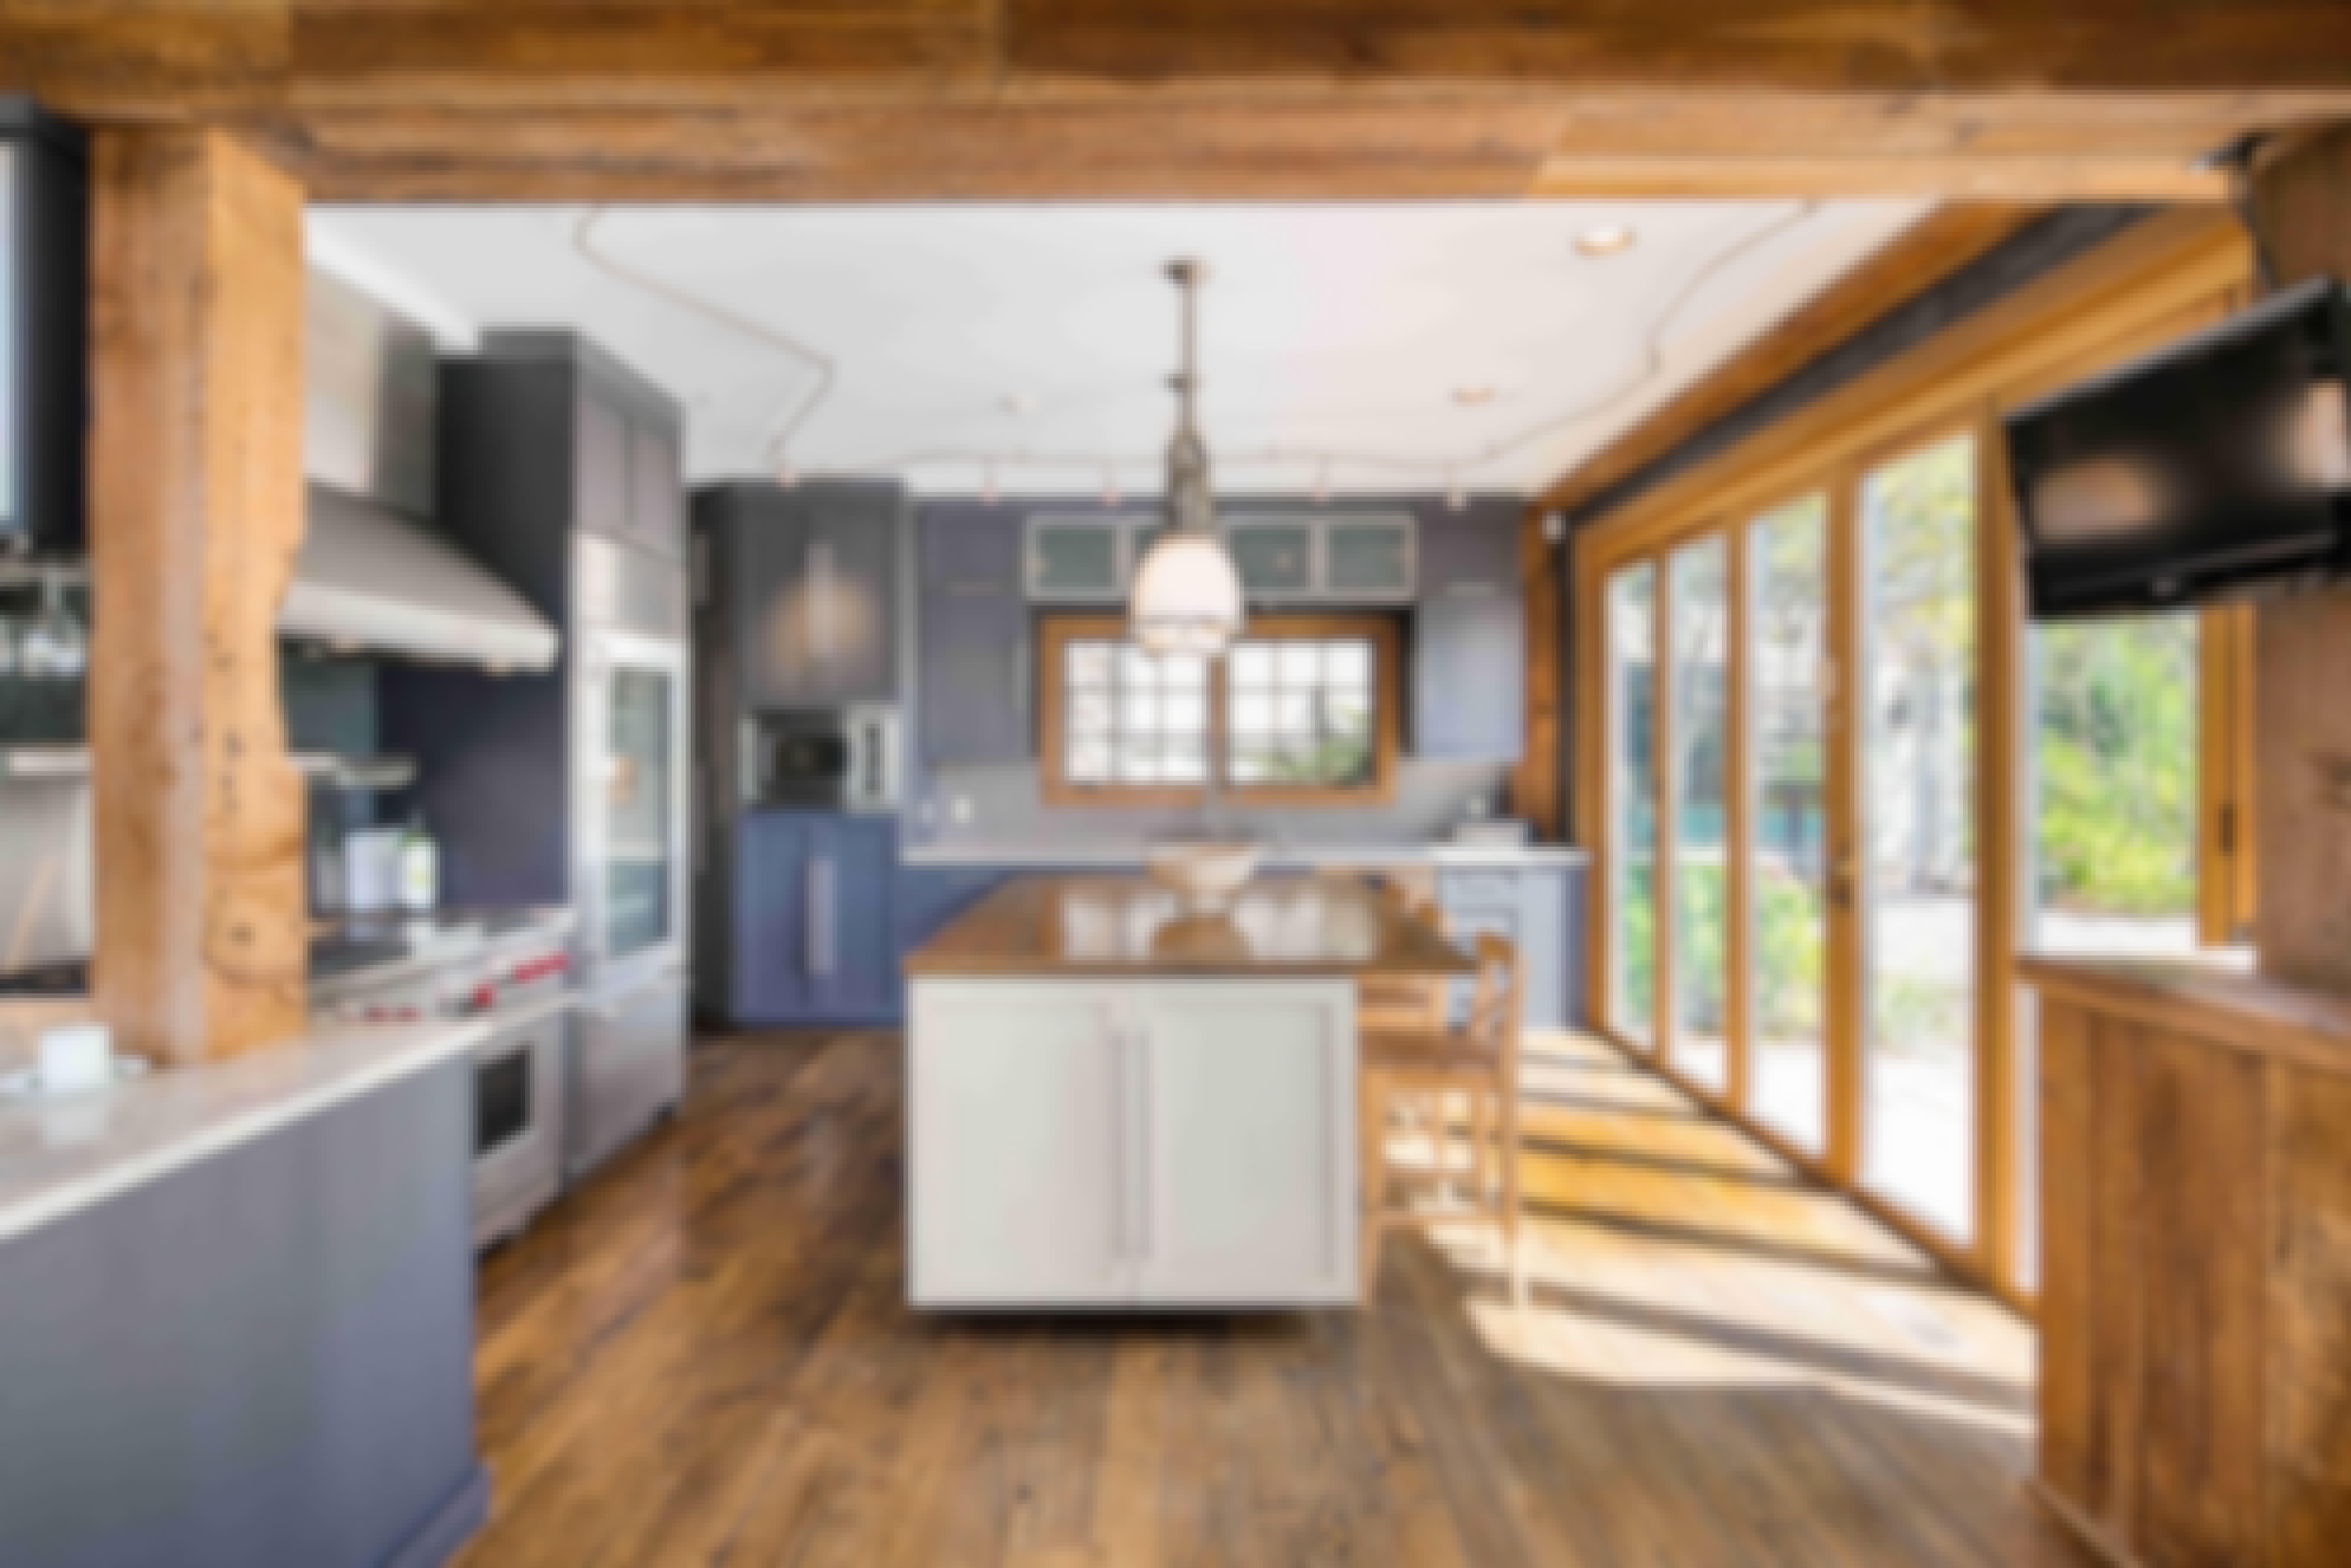 barn-kitchen-with-daylight